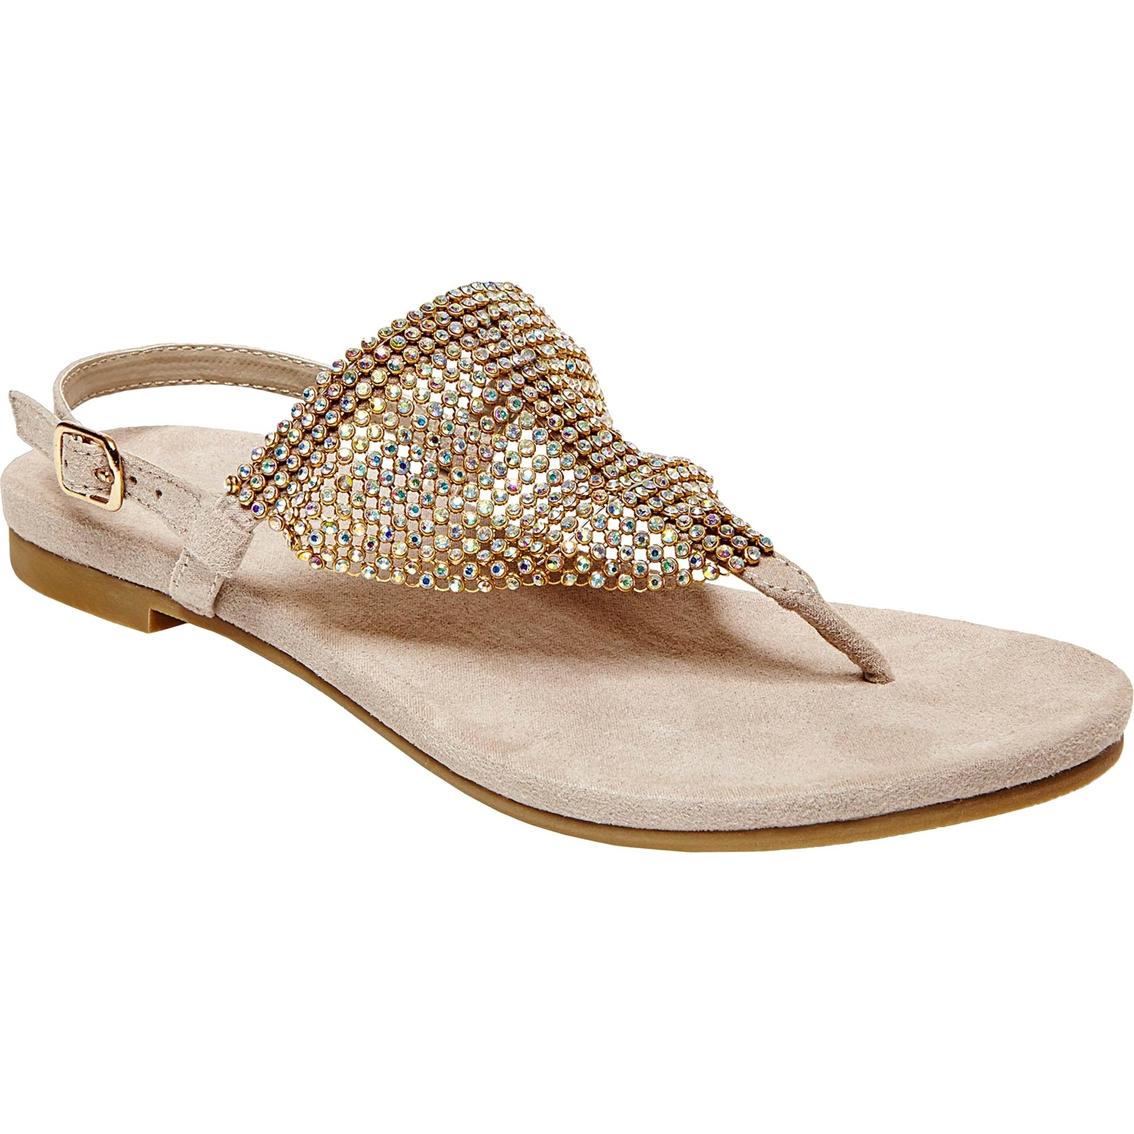 5683fe7b782e Madden Girl Daniii Flat Sandals